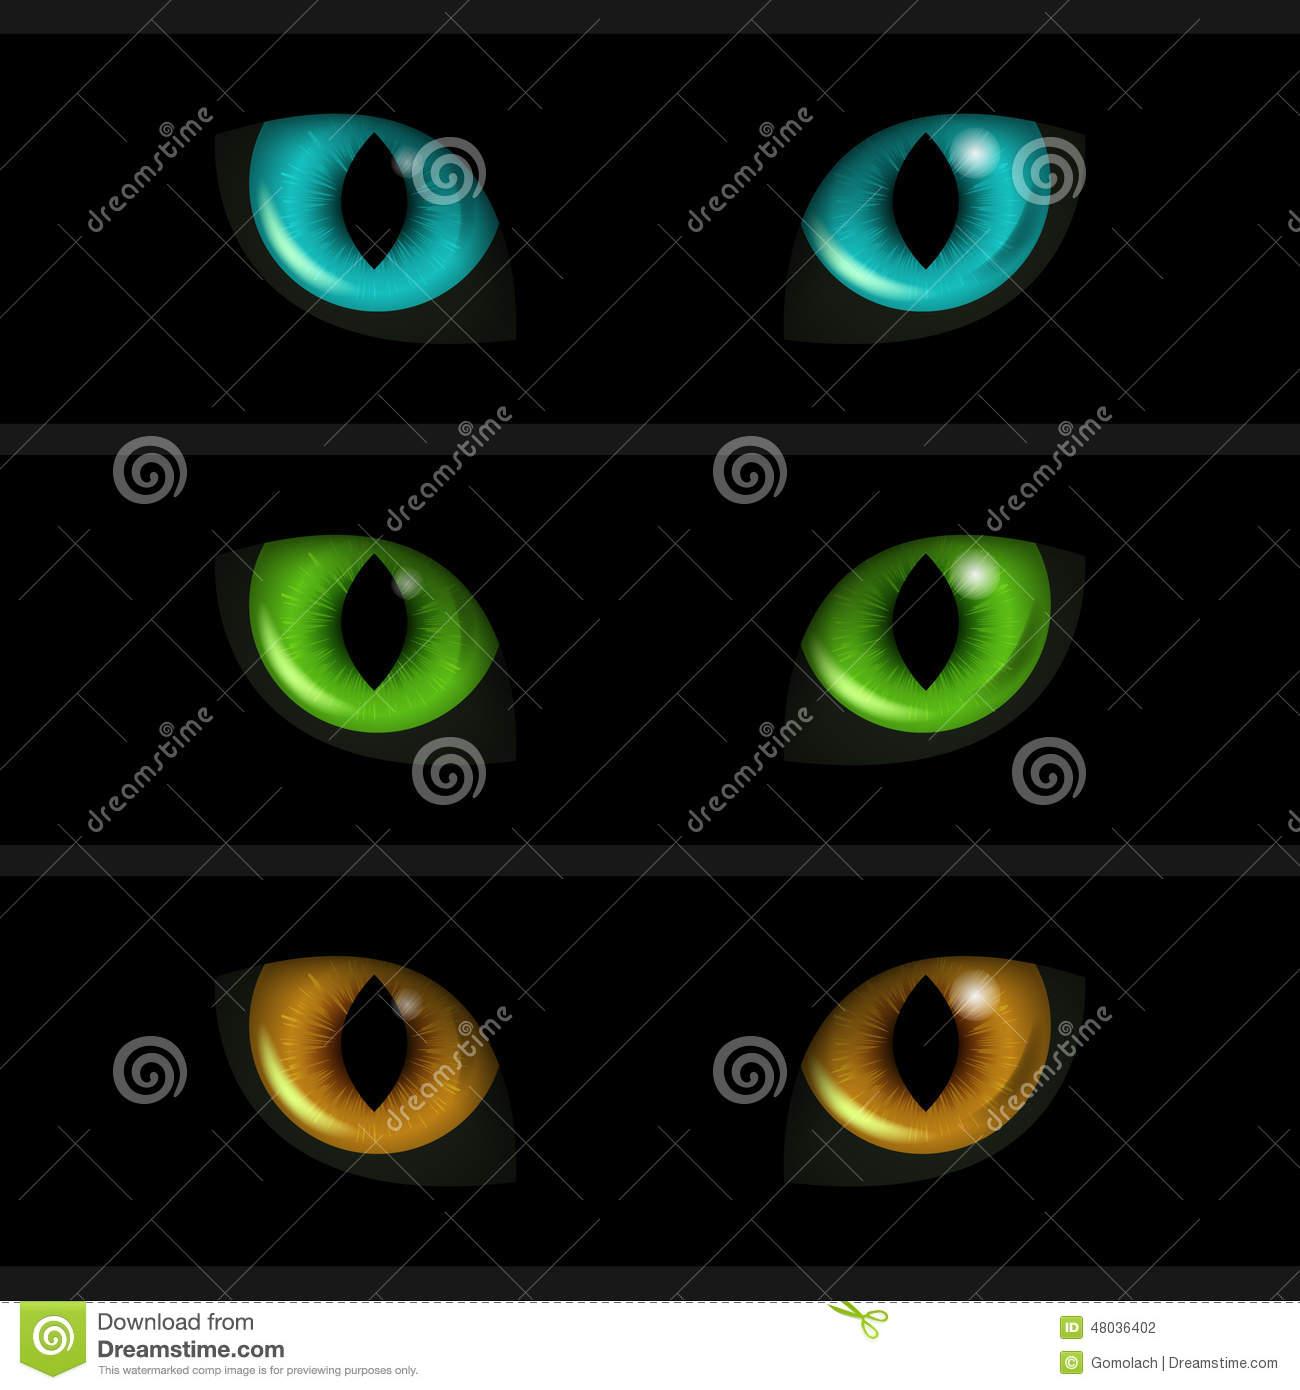 Black Cat Face Eyes Clip Art Stock Image.